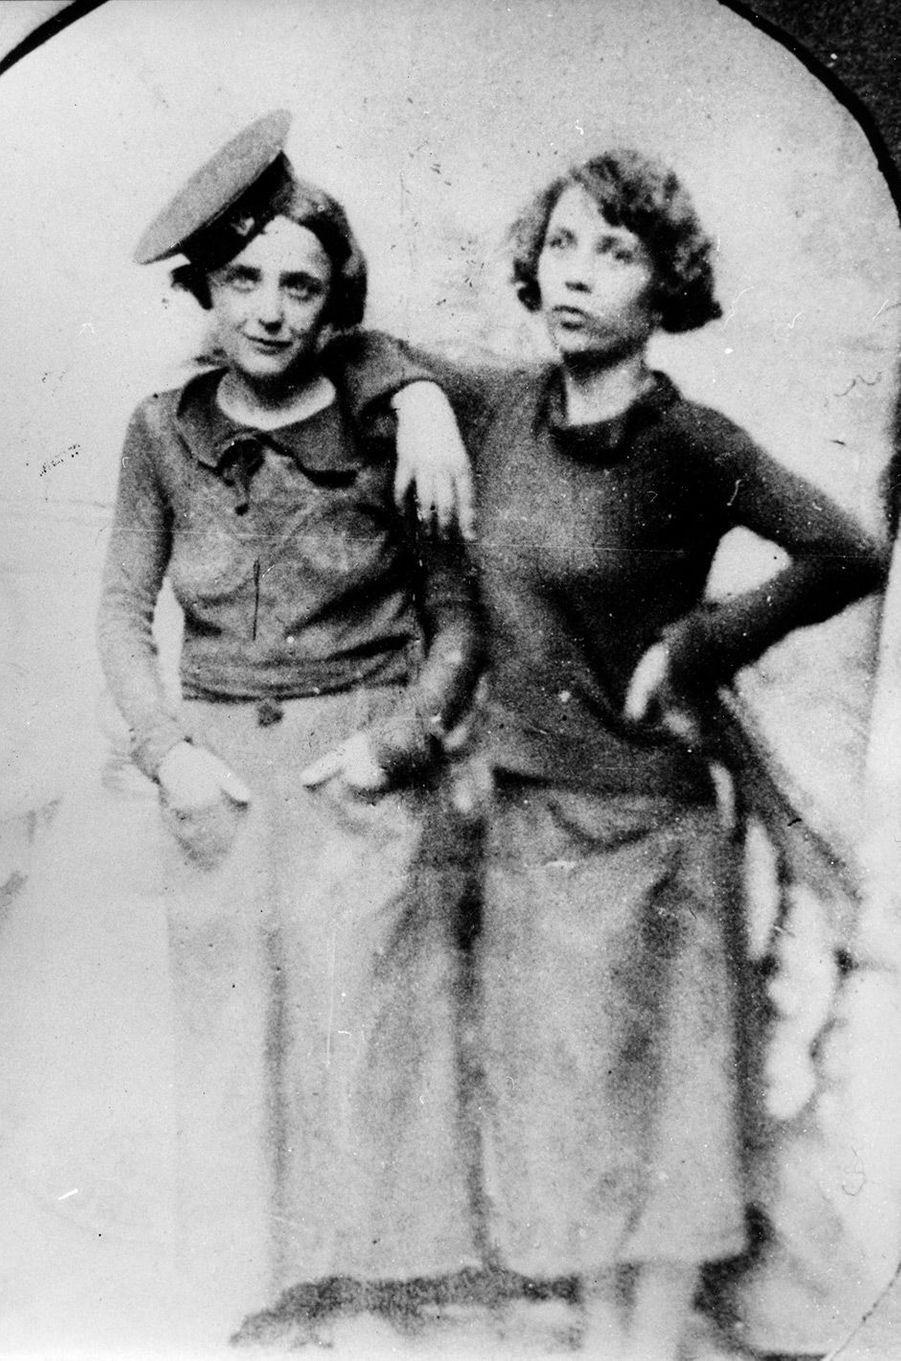 Edith Piaf avec Simone Berteaut en 1930